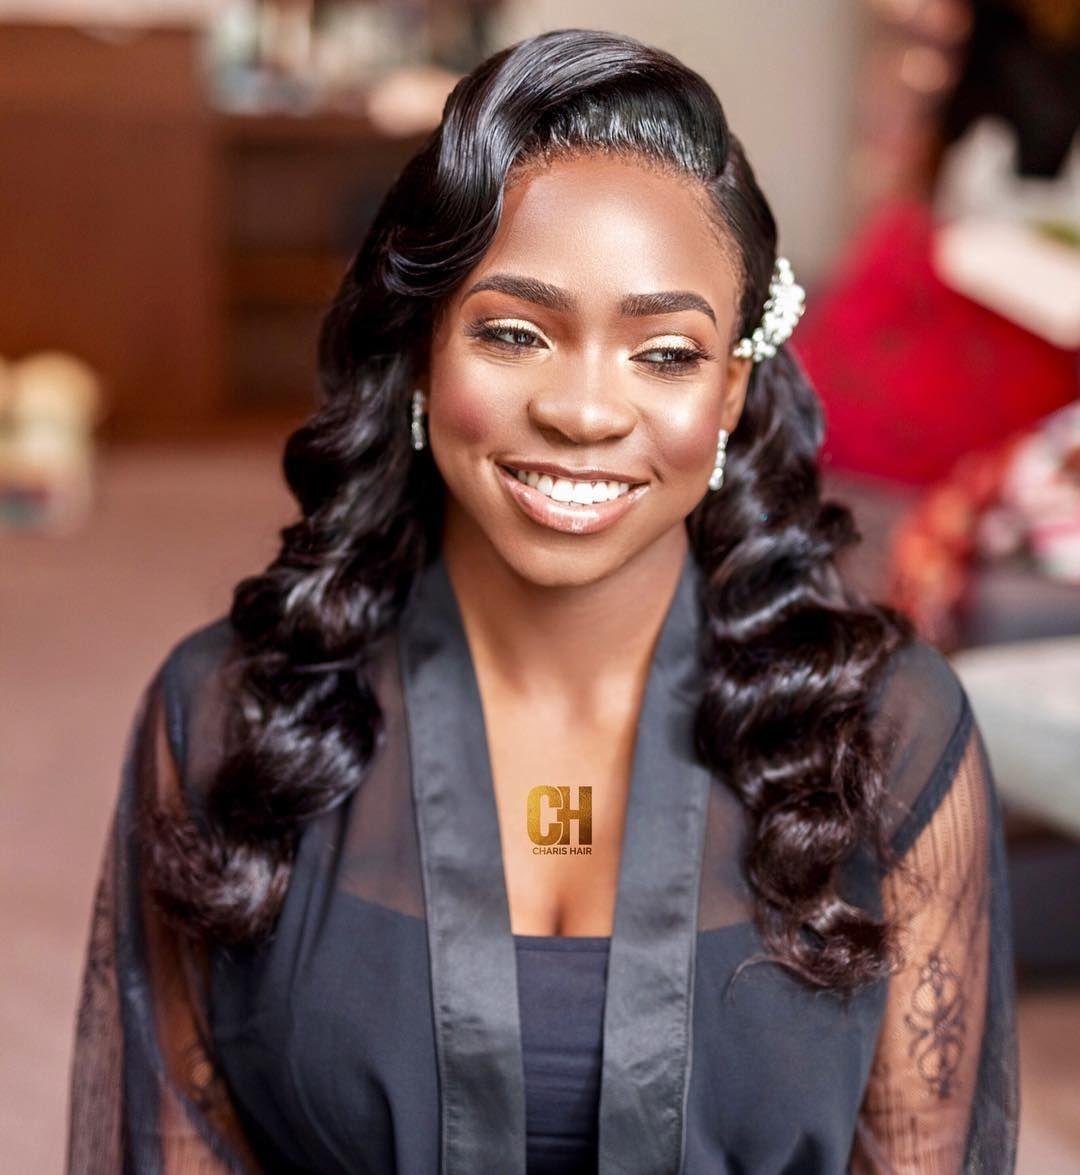 Bridal Hairstyles 41 Wedding Hairstyles For Black Women Click042 Black Wedding Hairstyles Wedding Hairstyles For Women Wedding Hairstyles Bridesmaid